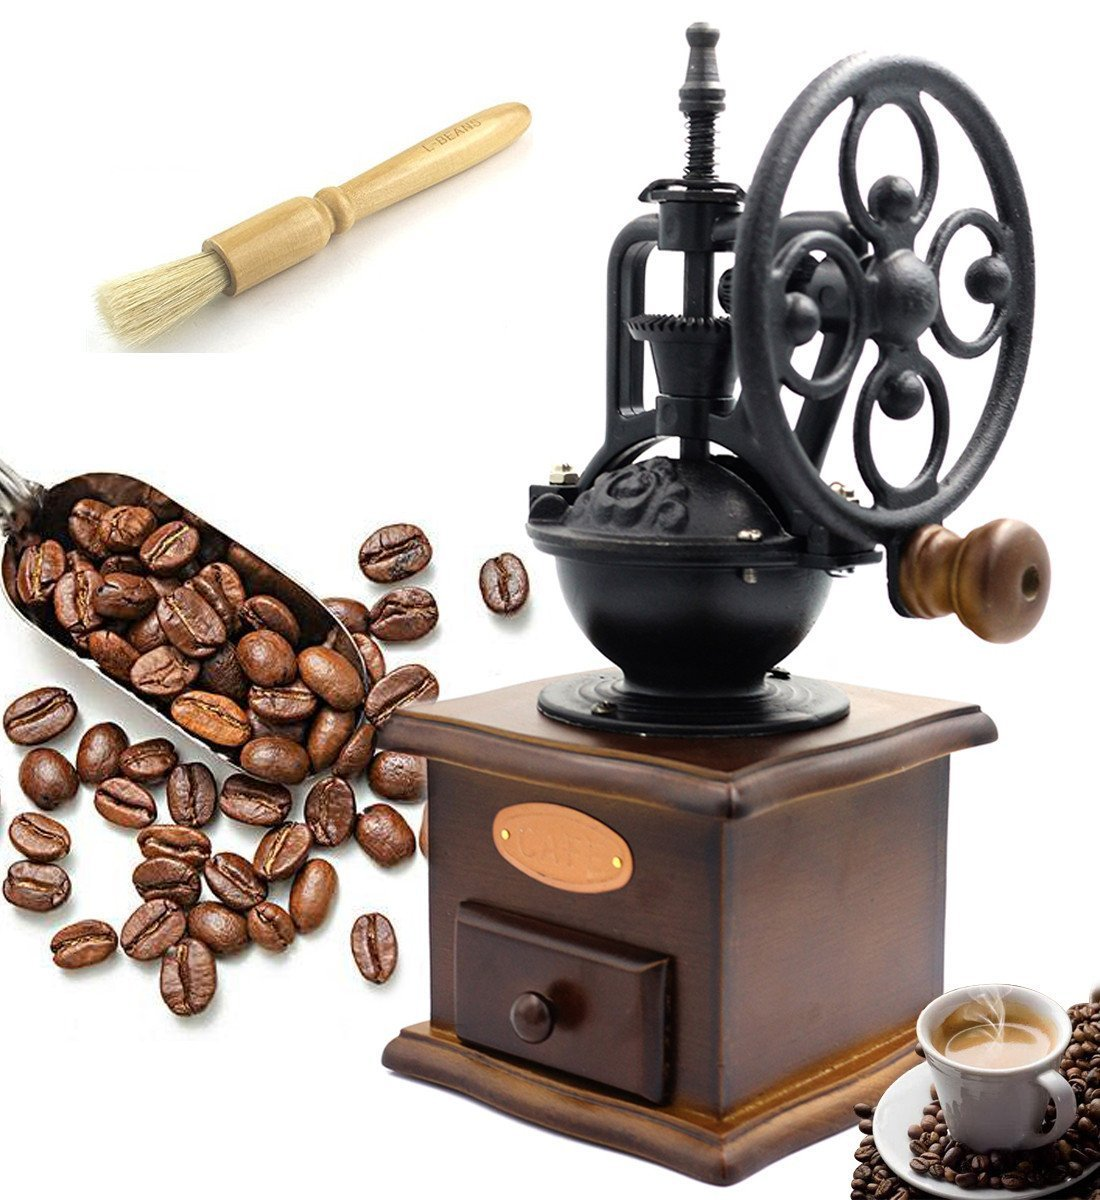 Fecihor Kaffeemühle Manuell Holz Hand Kaffeemühlen Retro Keramikmahlwerk Mit Reinigungsbürste